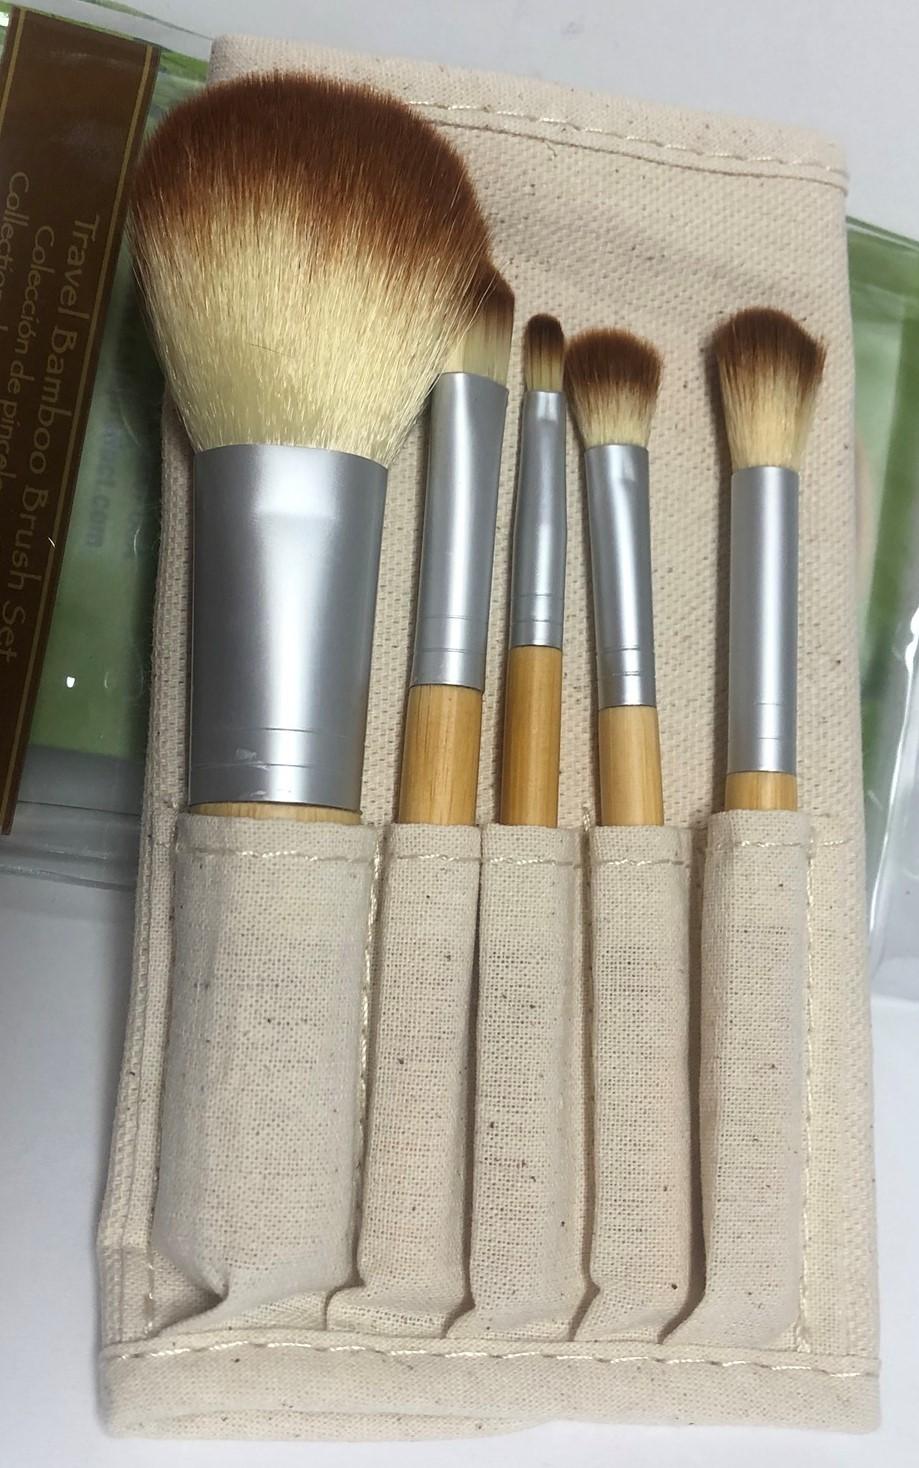 Cala Naturale Bamboo Make Up Brush Set 5 PC Pouch Travel Set image 4